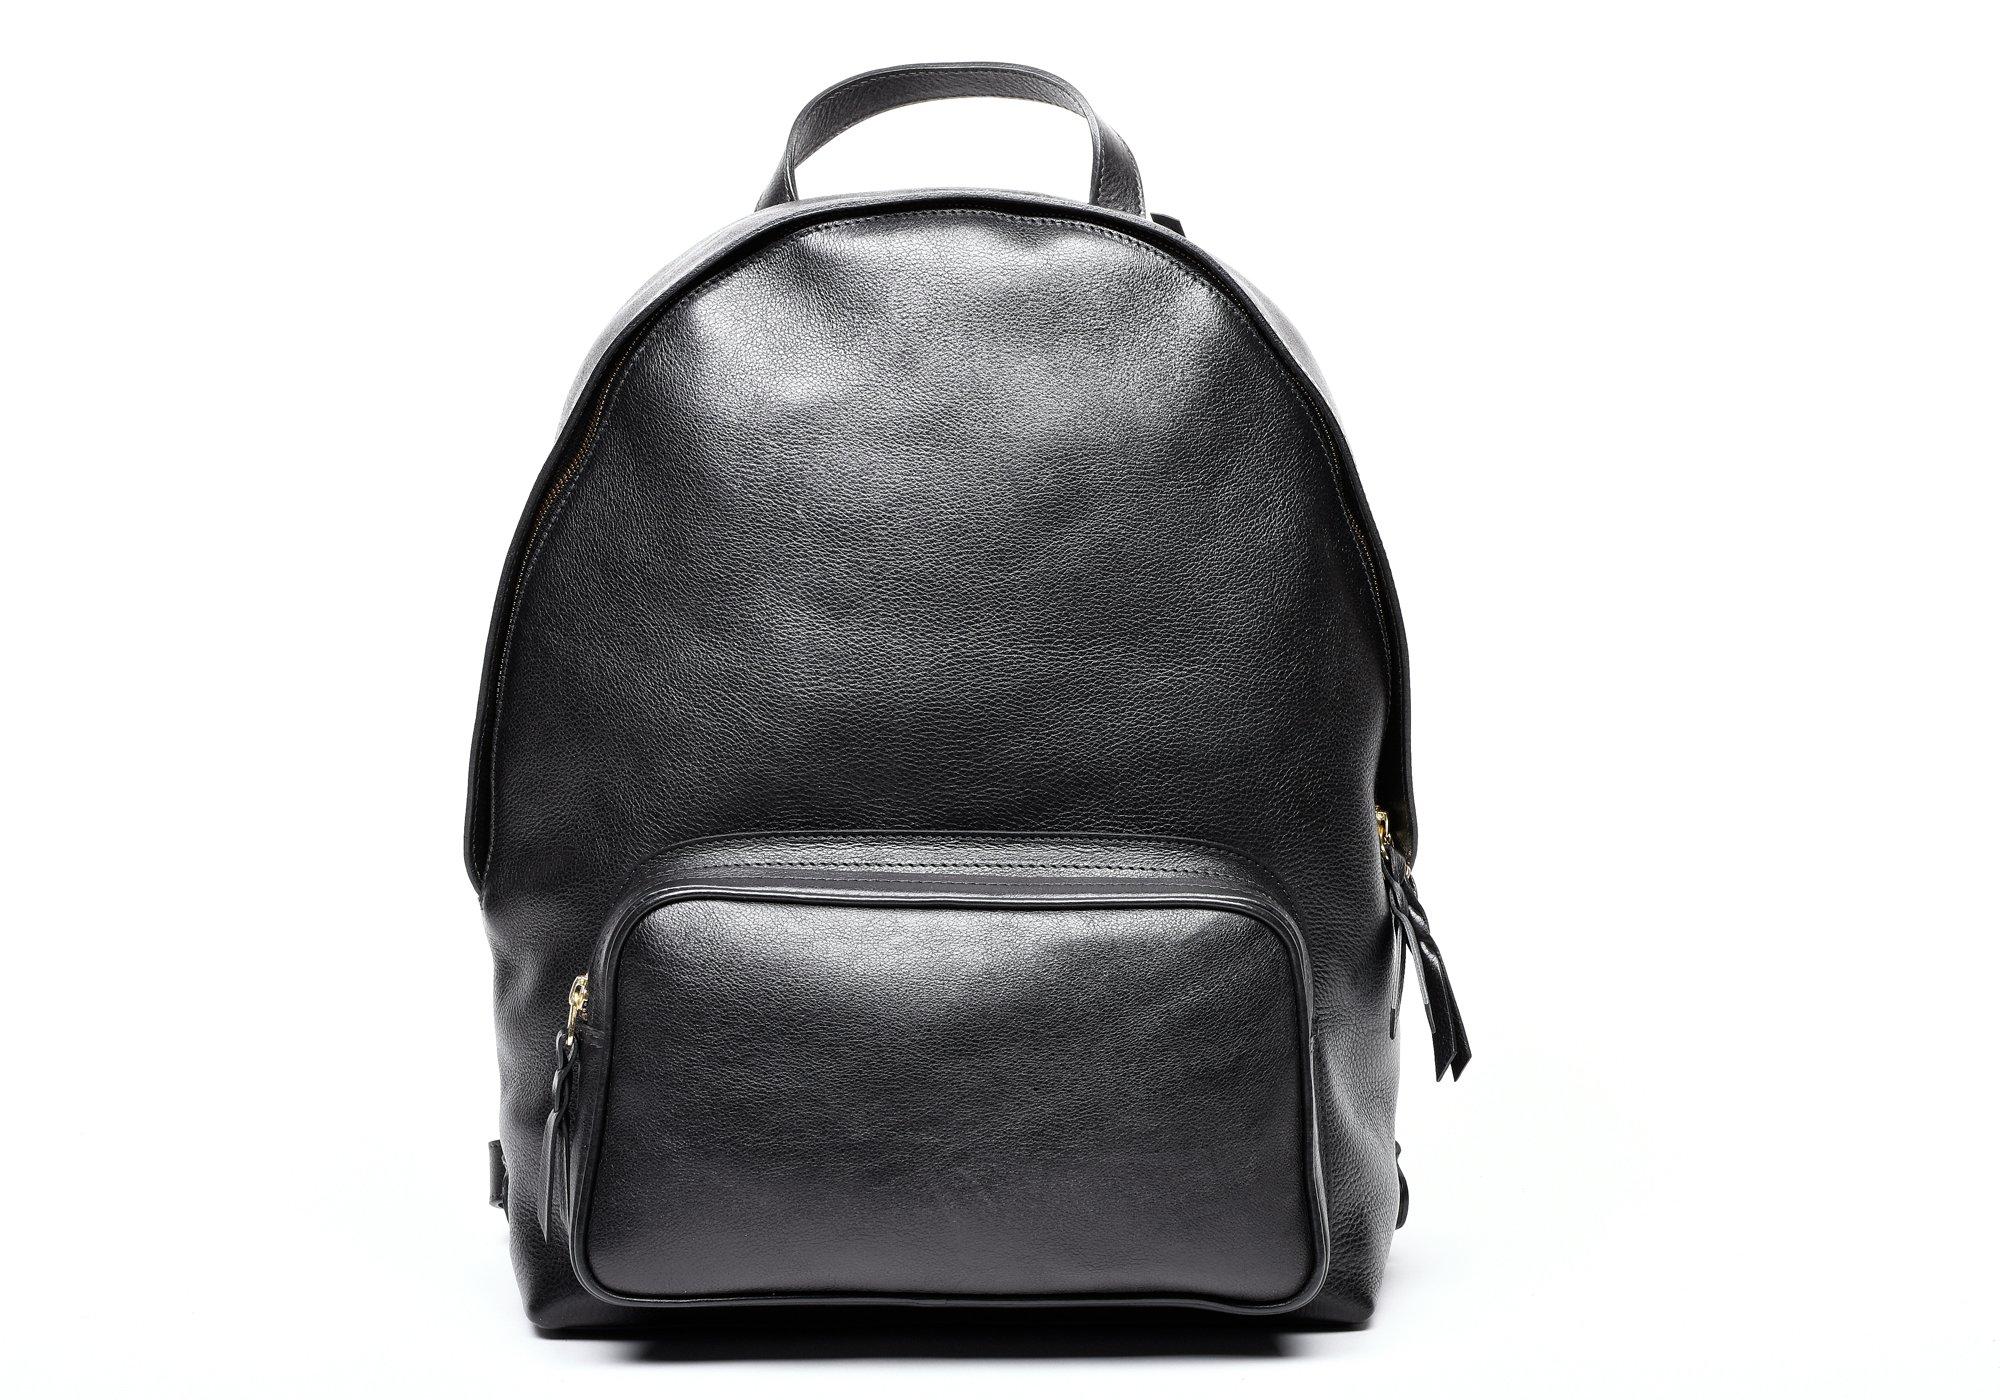 Lotuff-Leather-Zipper-Backpack_-Black-1_2000x.progressive